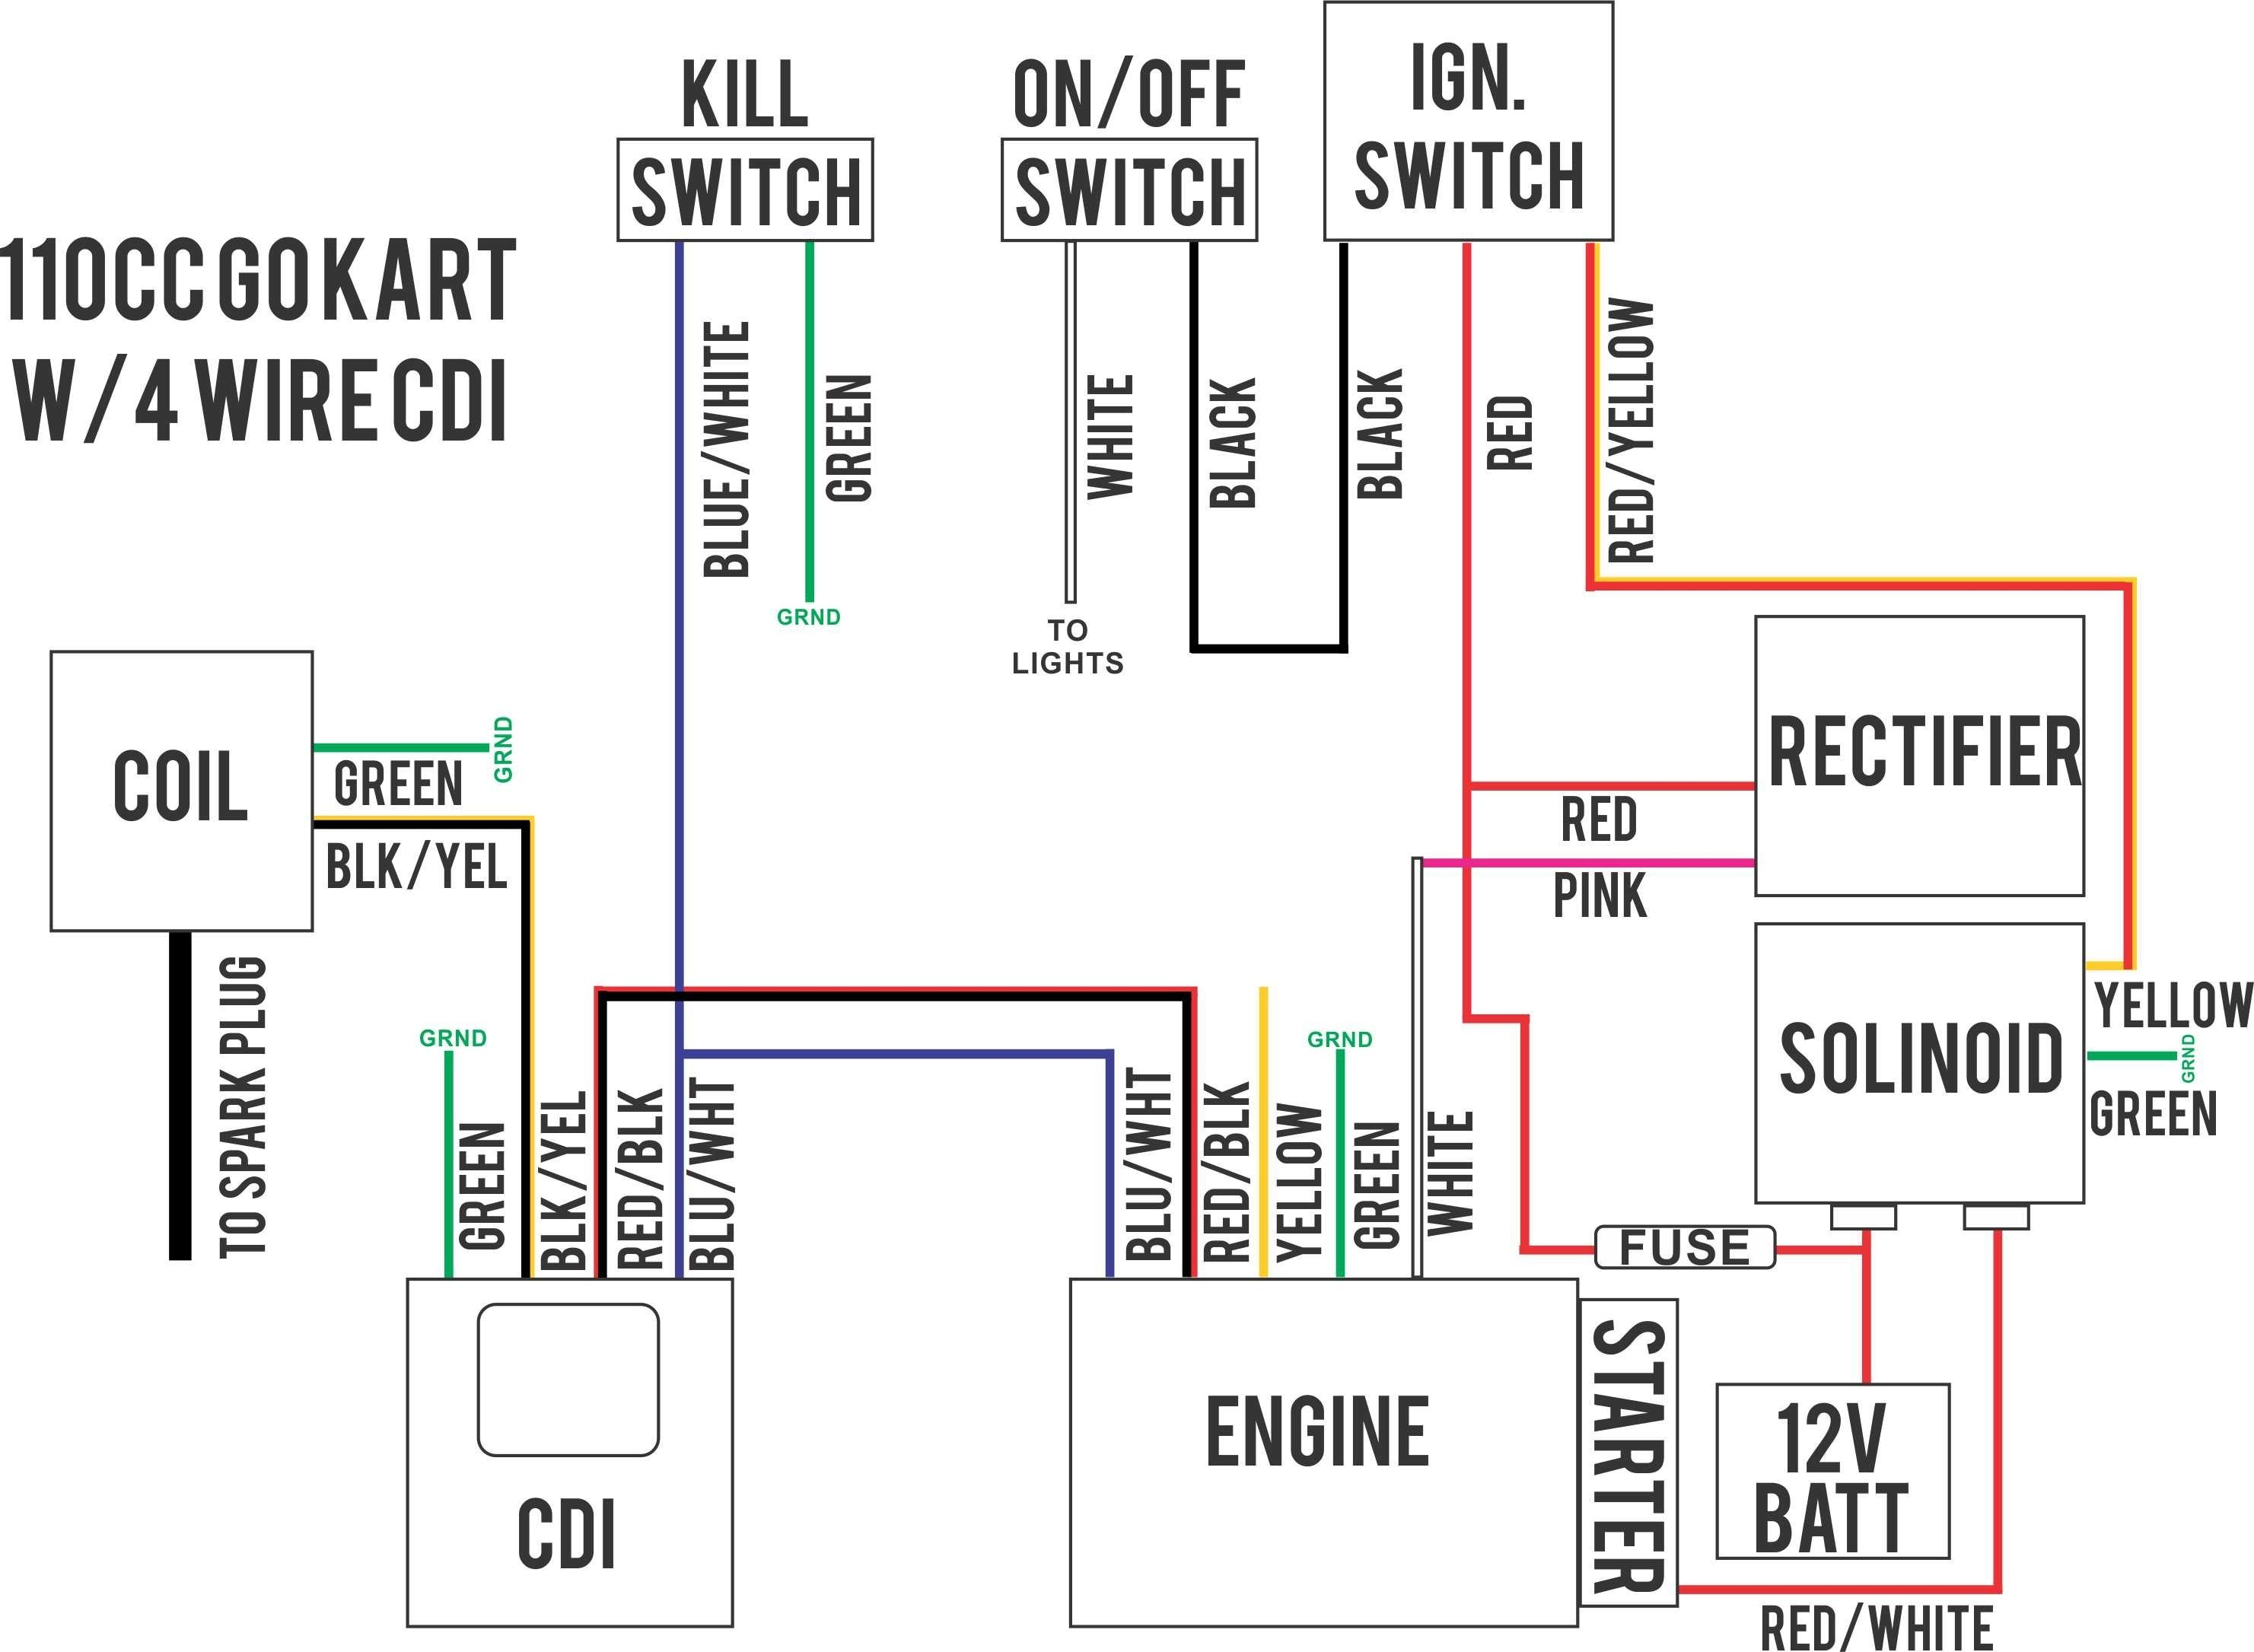 X8 Pocket Bike 110cc Wiring Diagram - X Ray Tube Circuit Diagram -  light-switch.yenpancane.jeanjaures37.fr | X8 Wiring Diagram |  | Wiring Diagram Resource